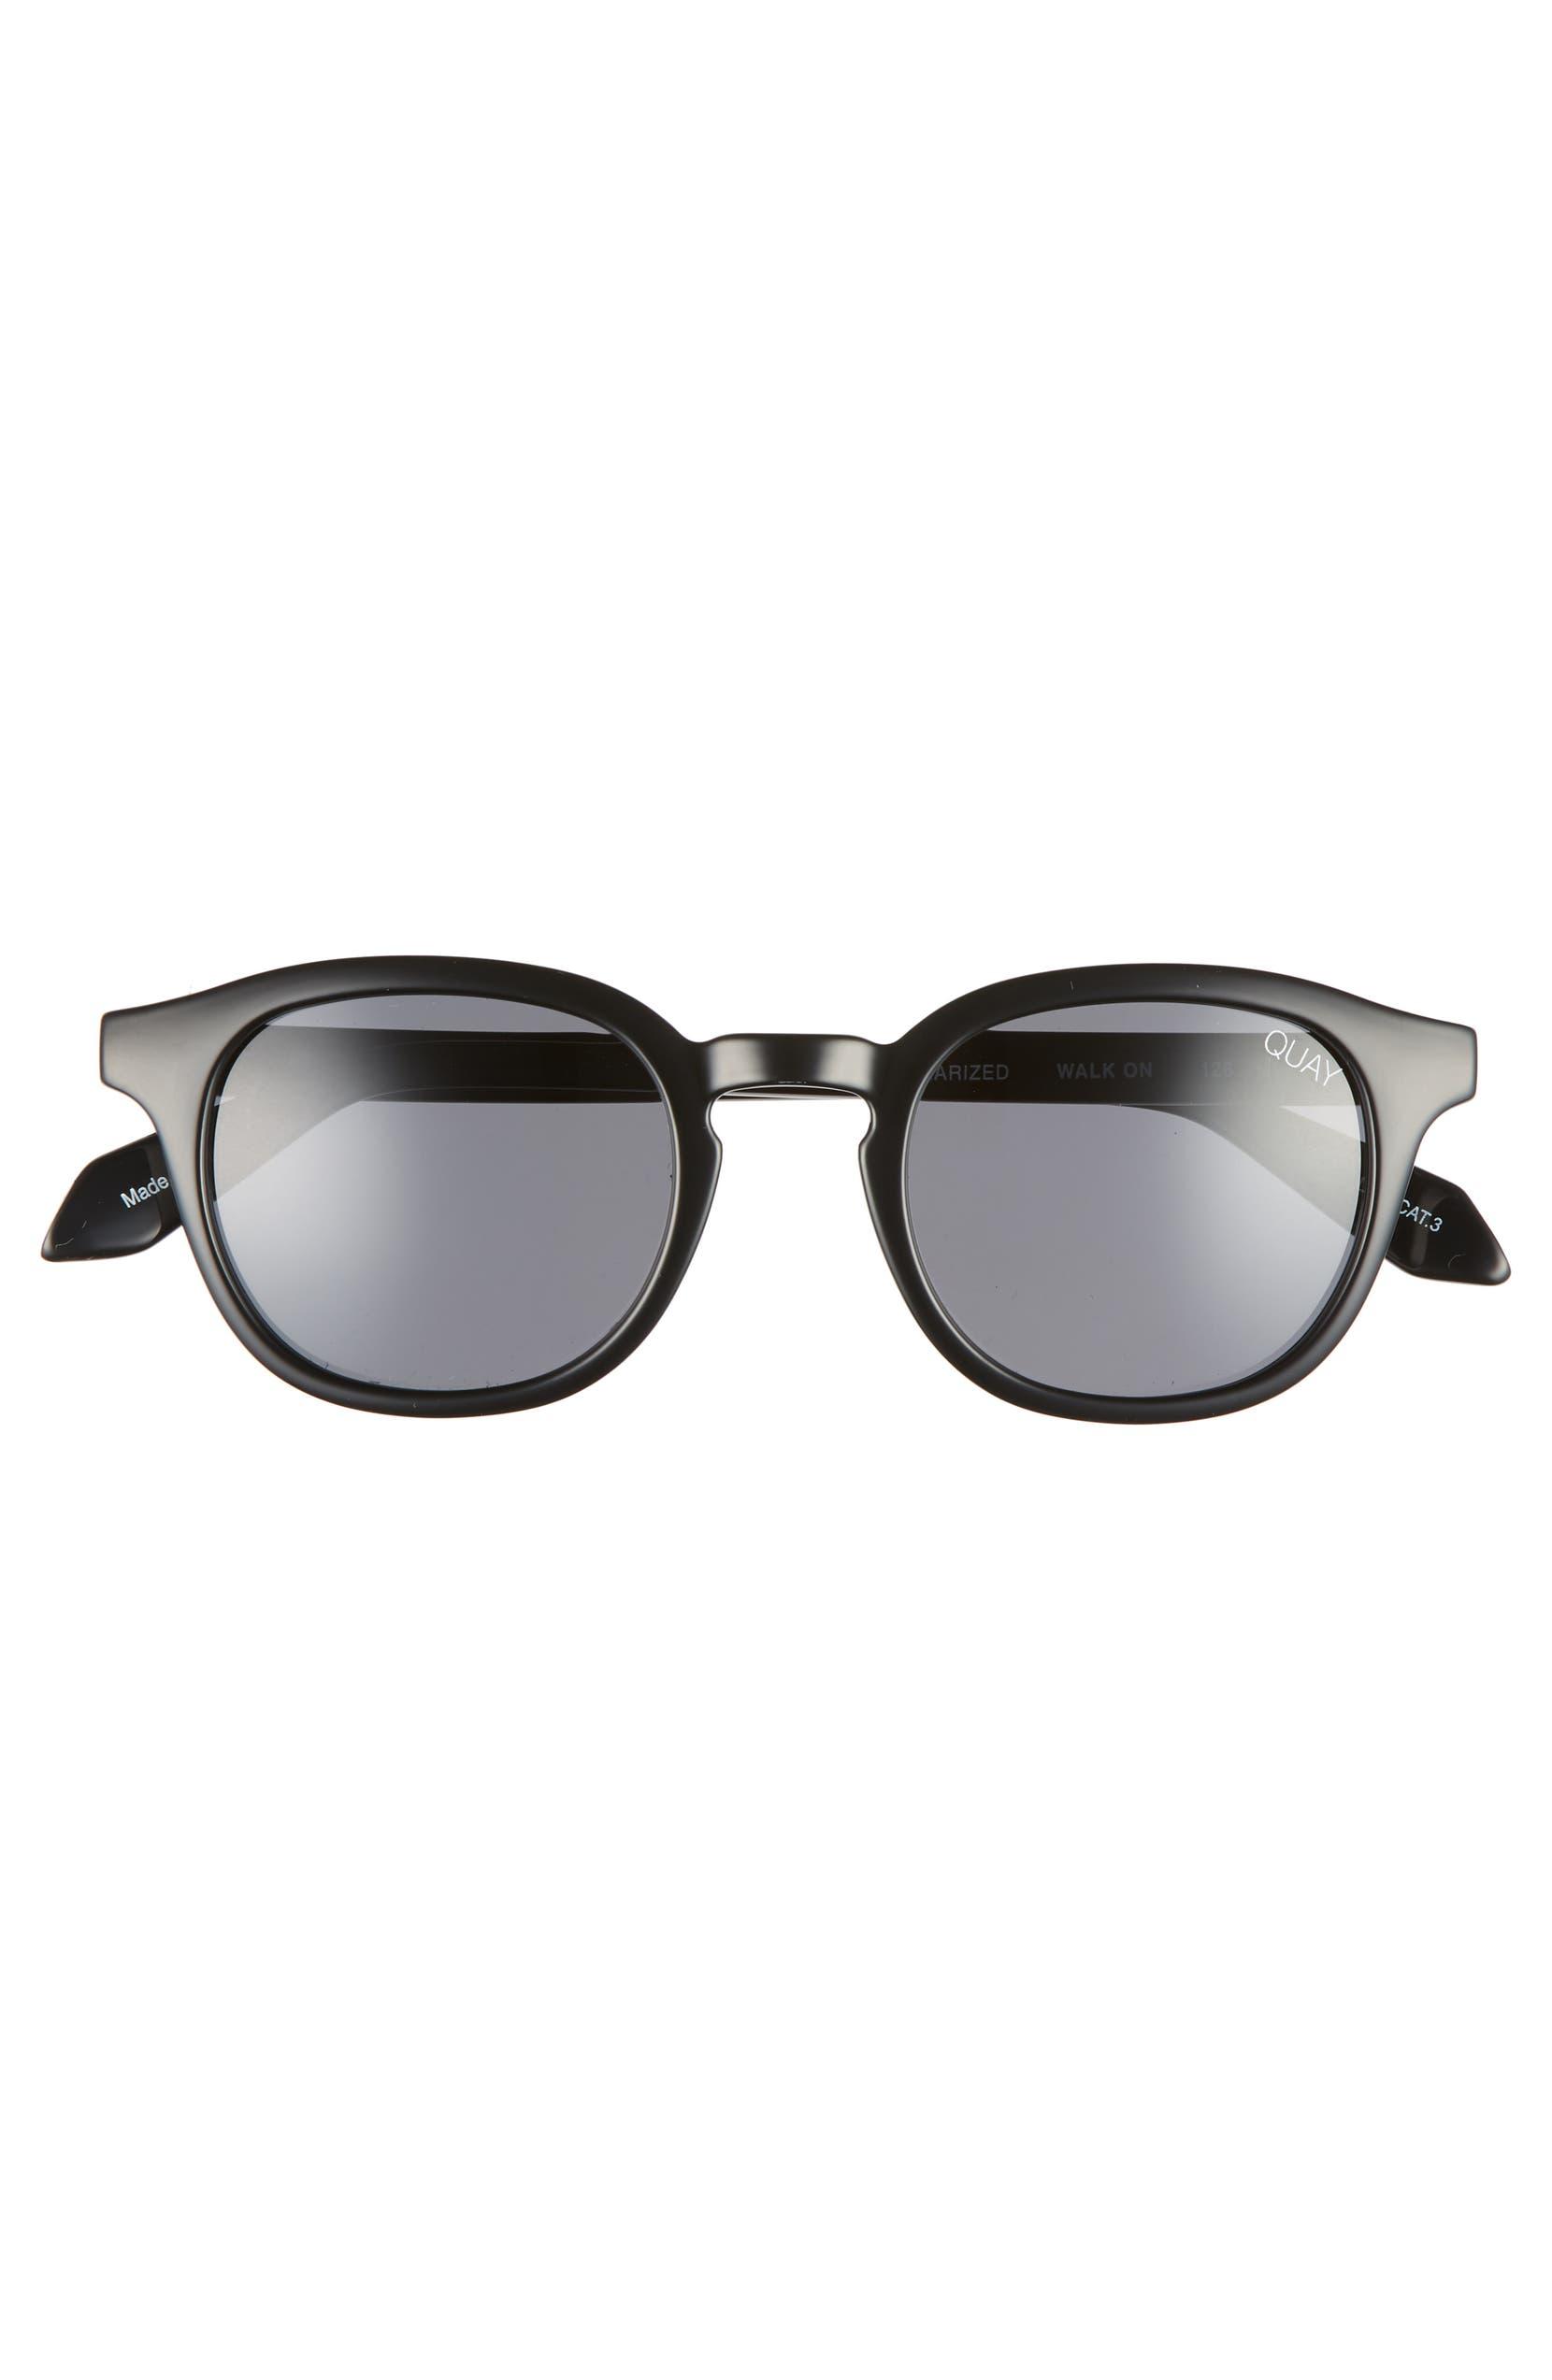 19258d30 Quay Australia Walk On 47mm Polarized Sunglasses | Nordstrom